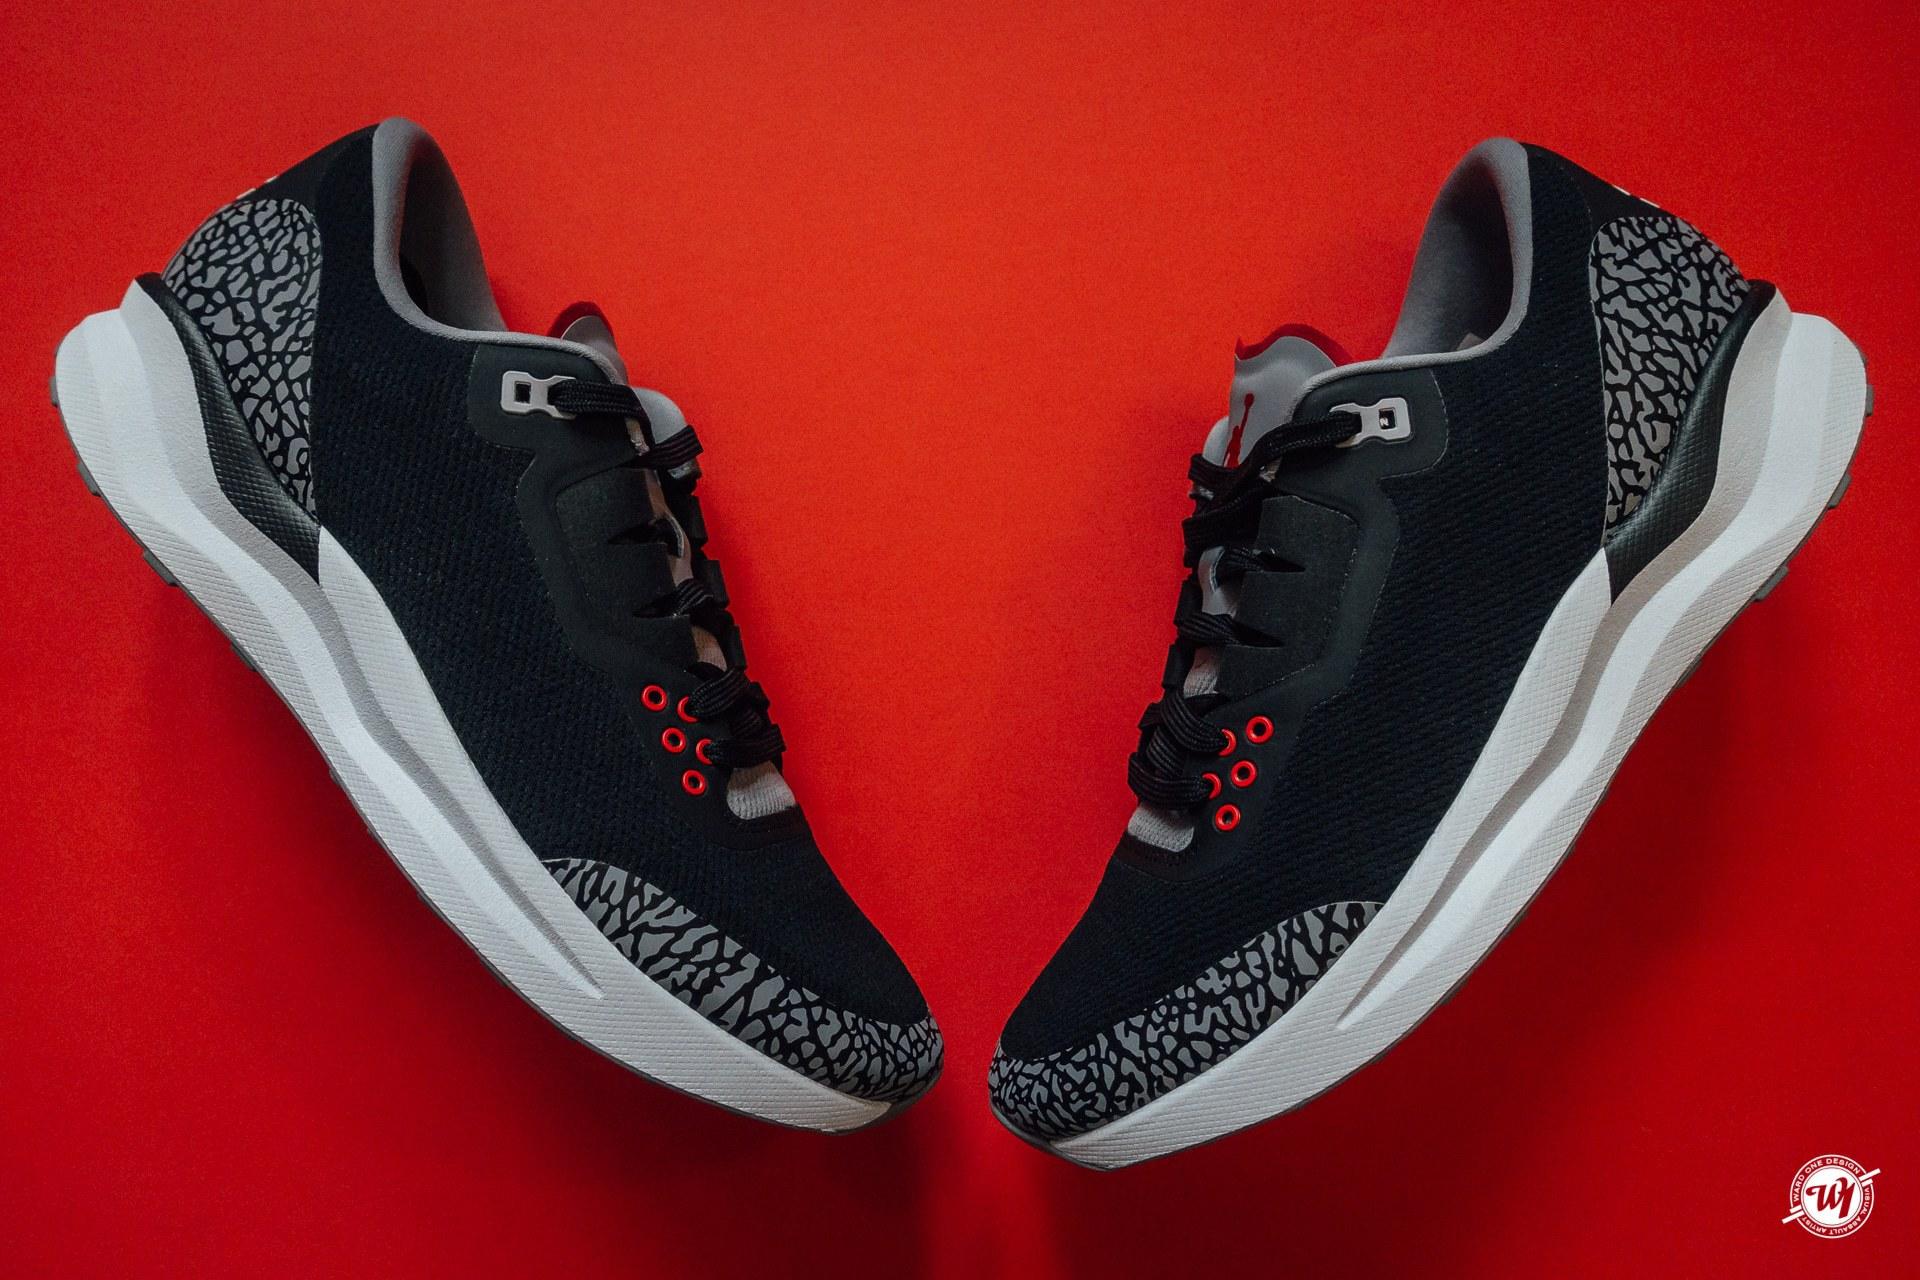 The Jordan Zoom Tenacity 88 - Black Cement